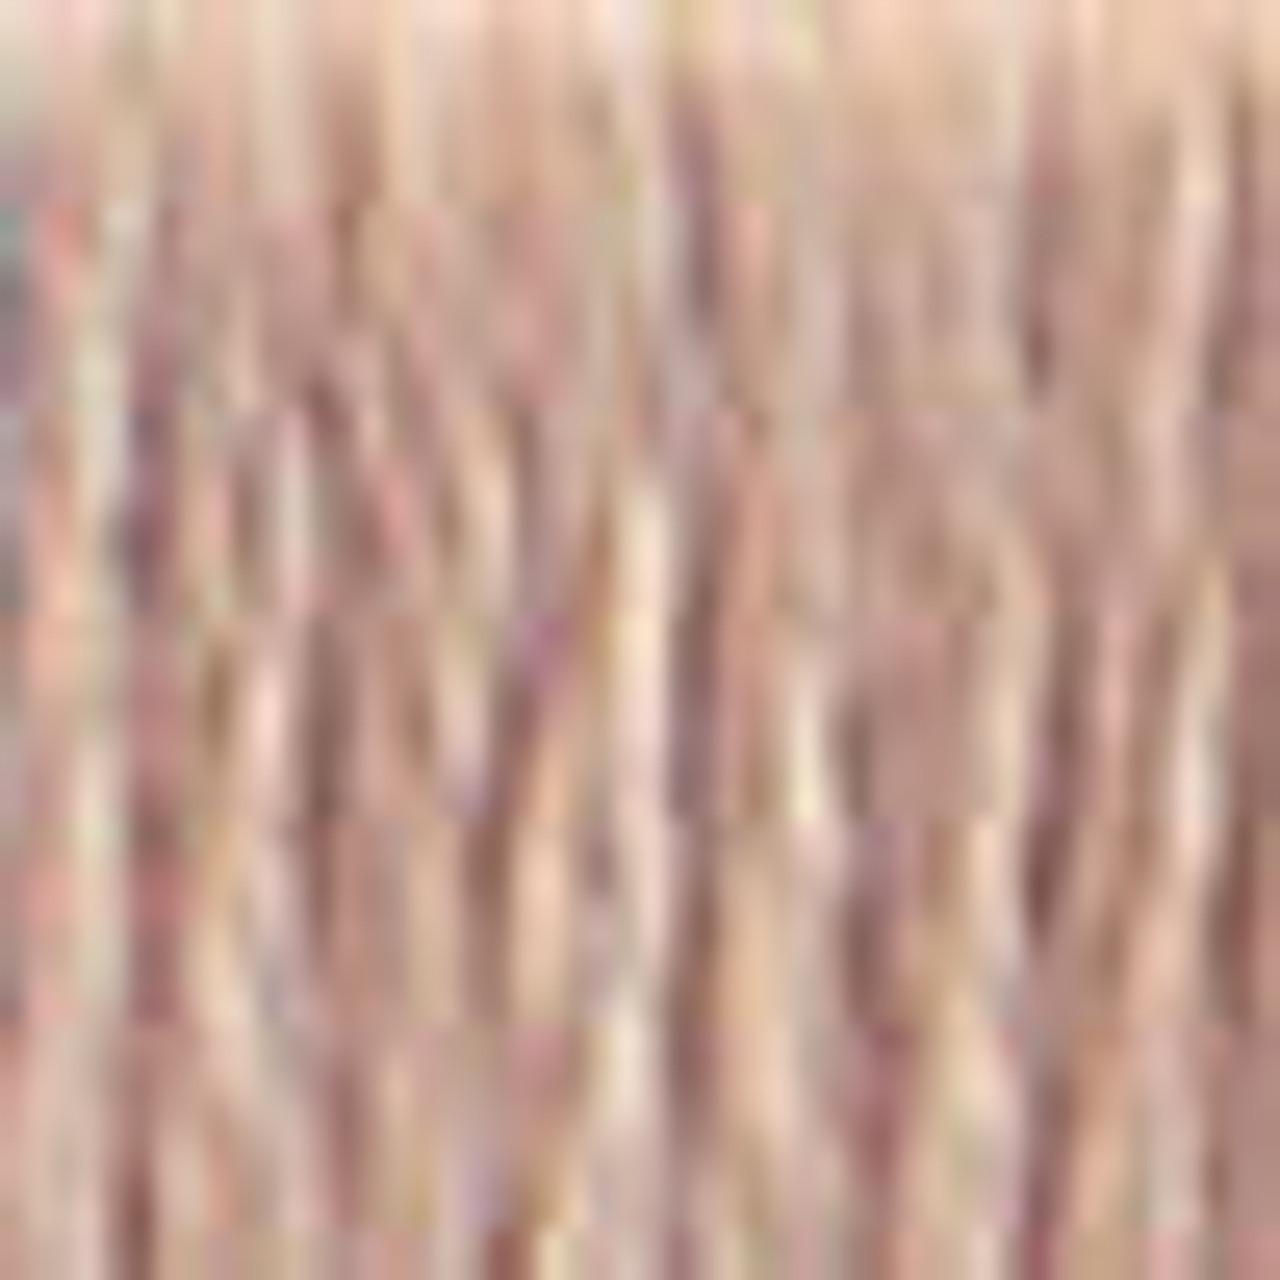 DMC # 3782 Light Mocha Brown Floss / Thread